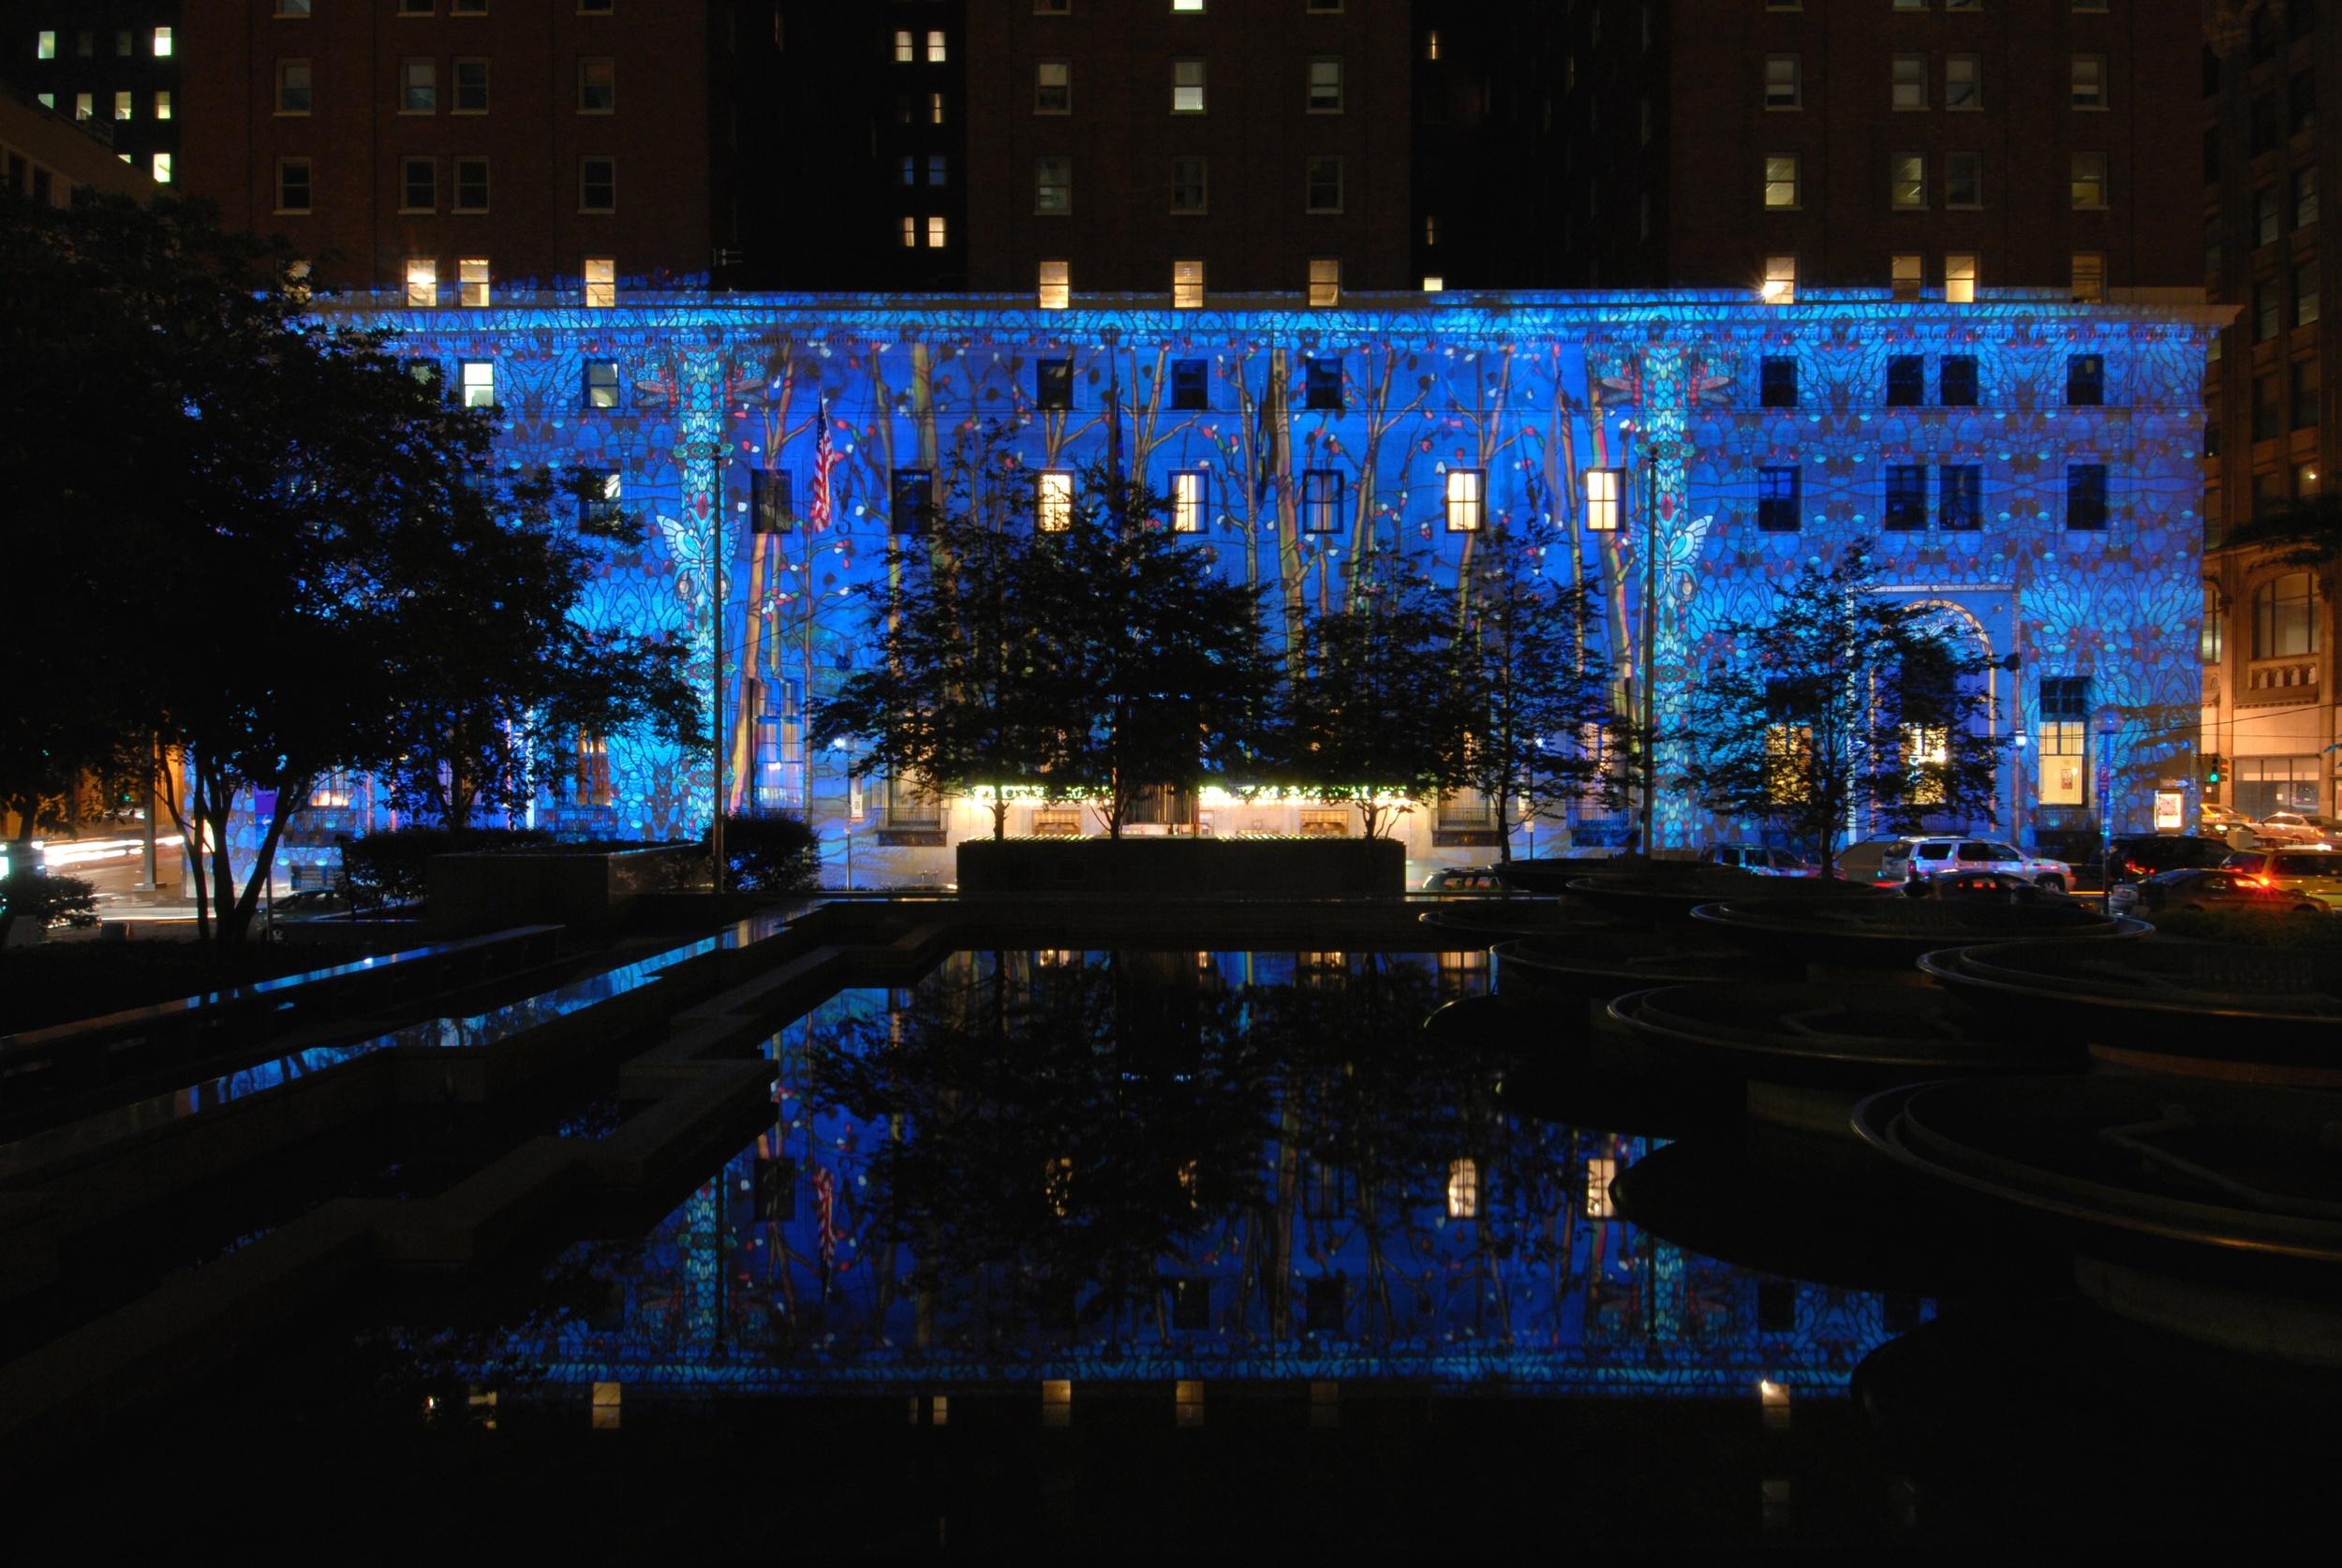 Pittsburgh Festival of Lights